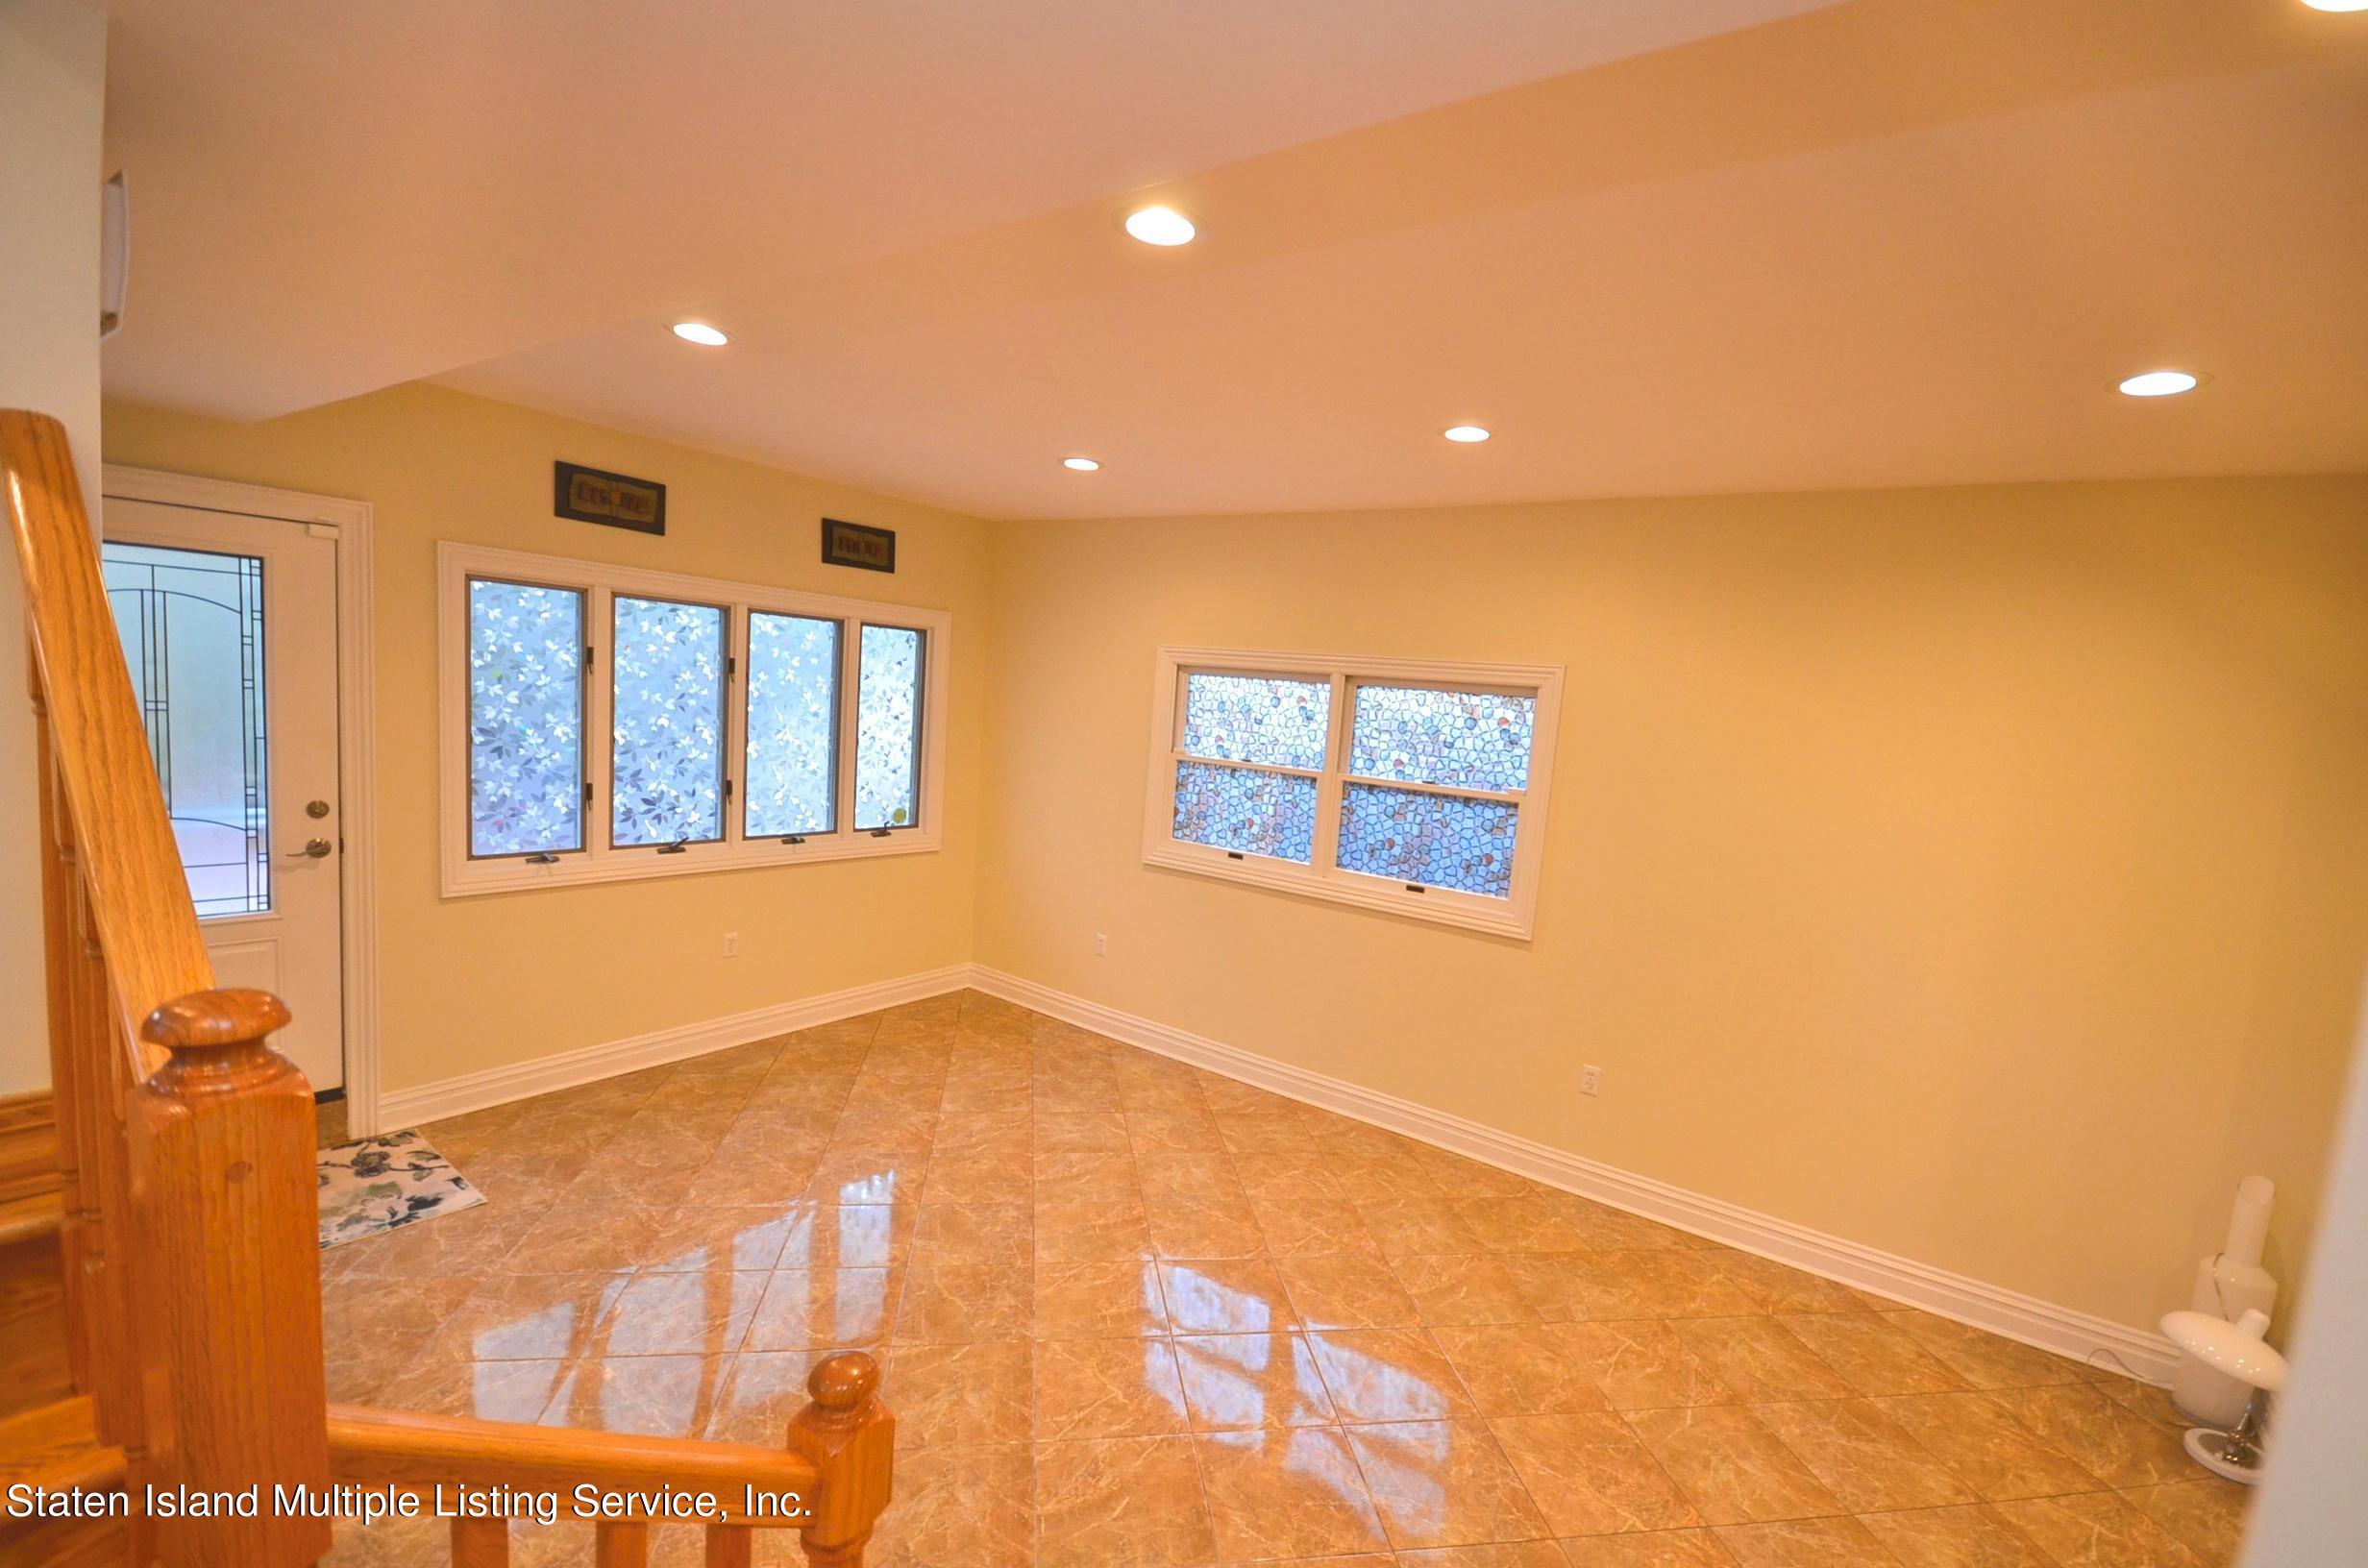 Single Family - Detached 48 Ocean Terrace  Staten Island, NY 10314, MLS-1142240-24